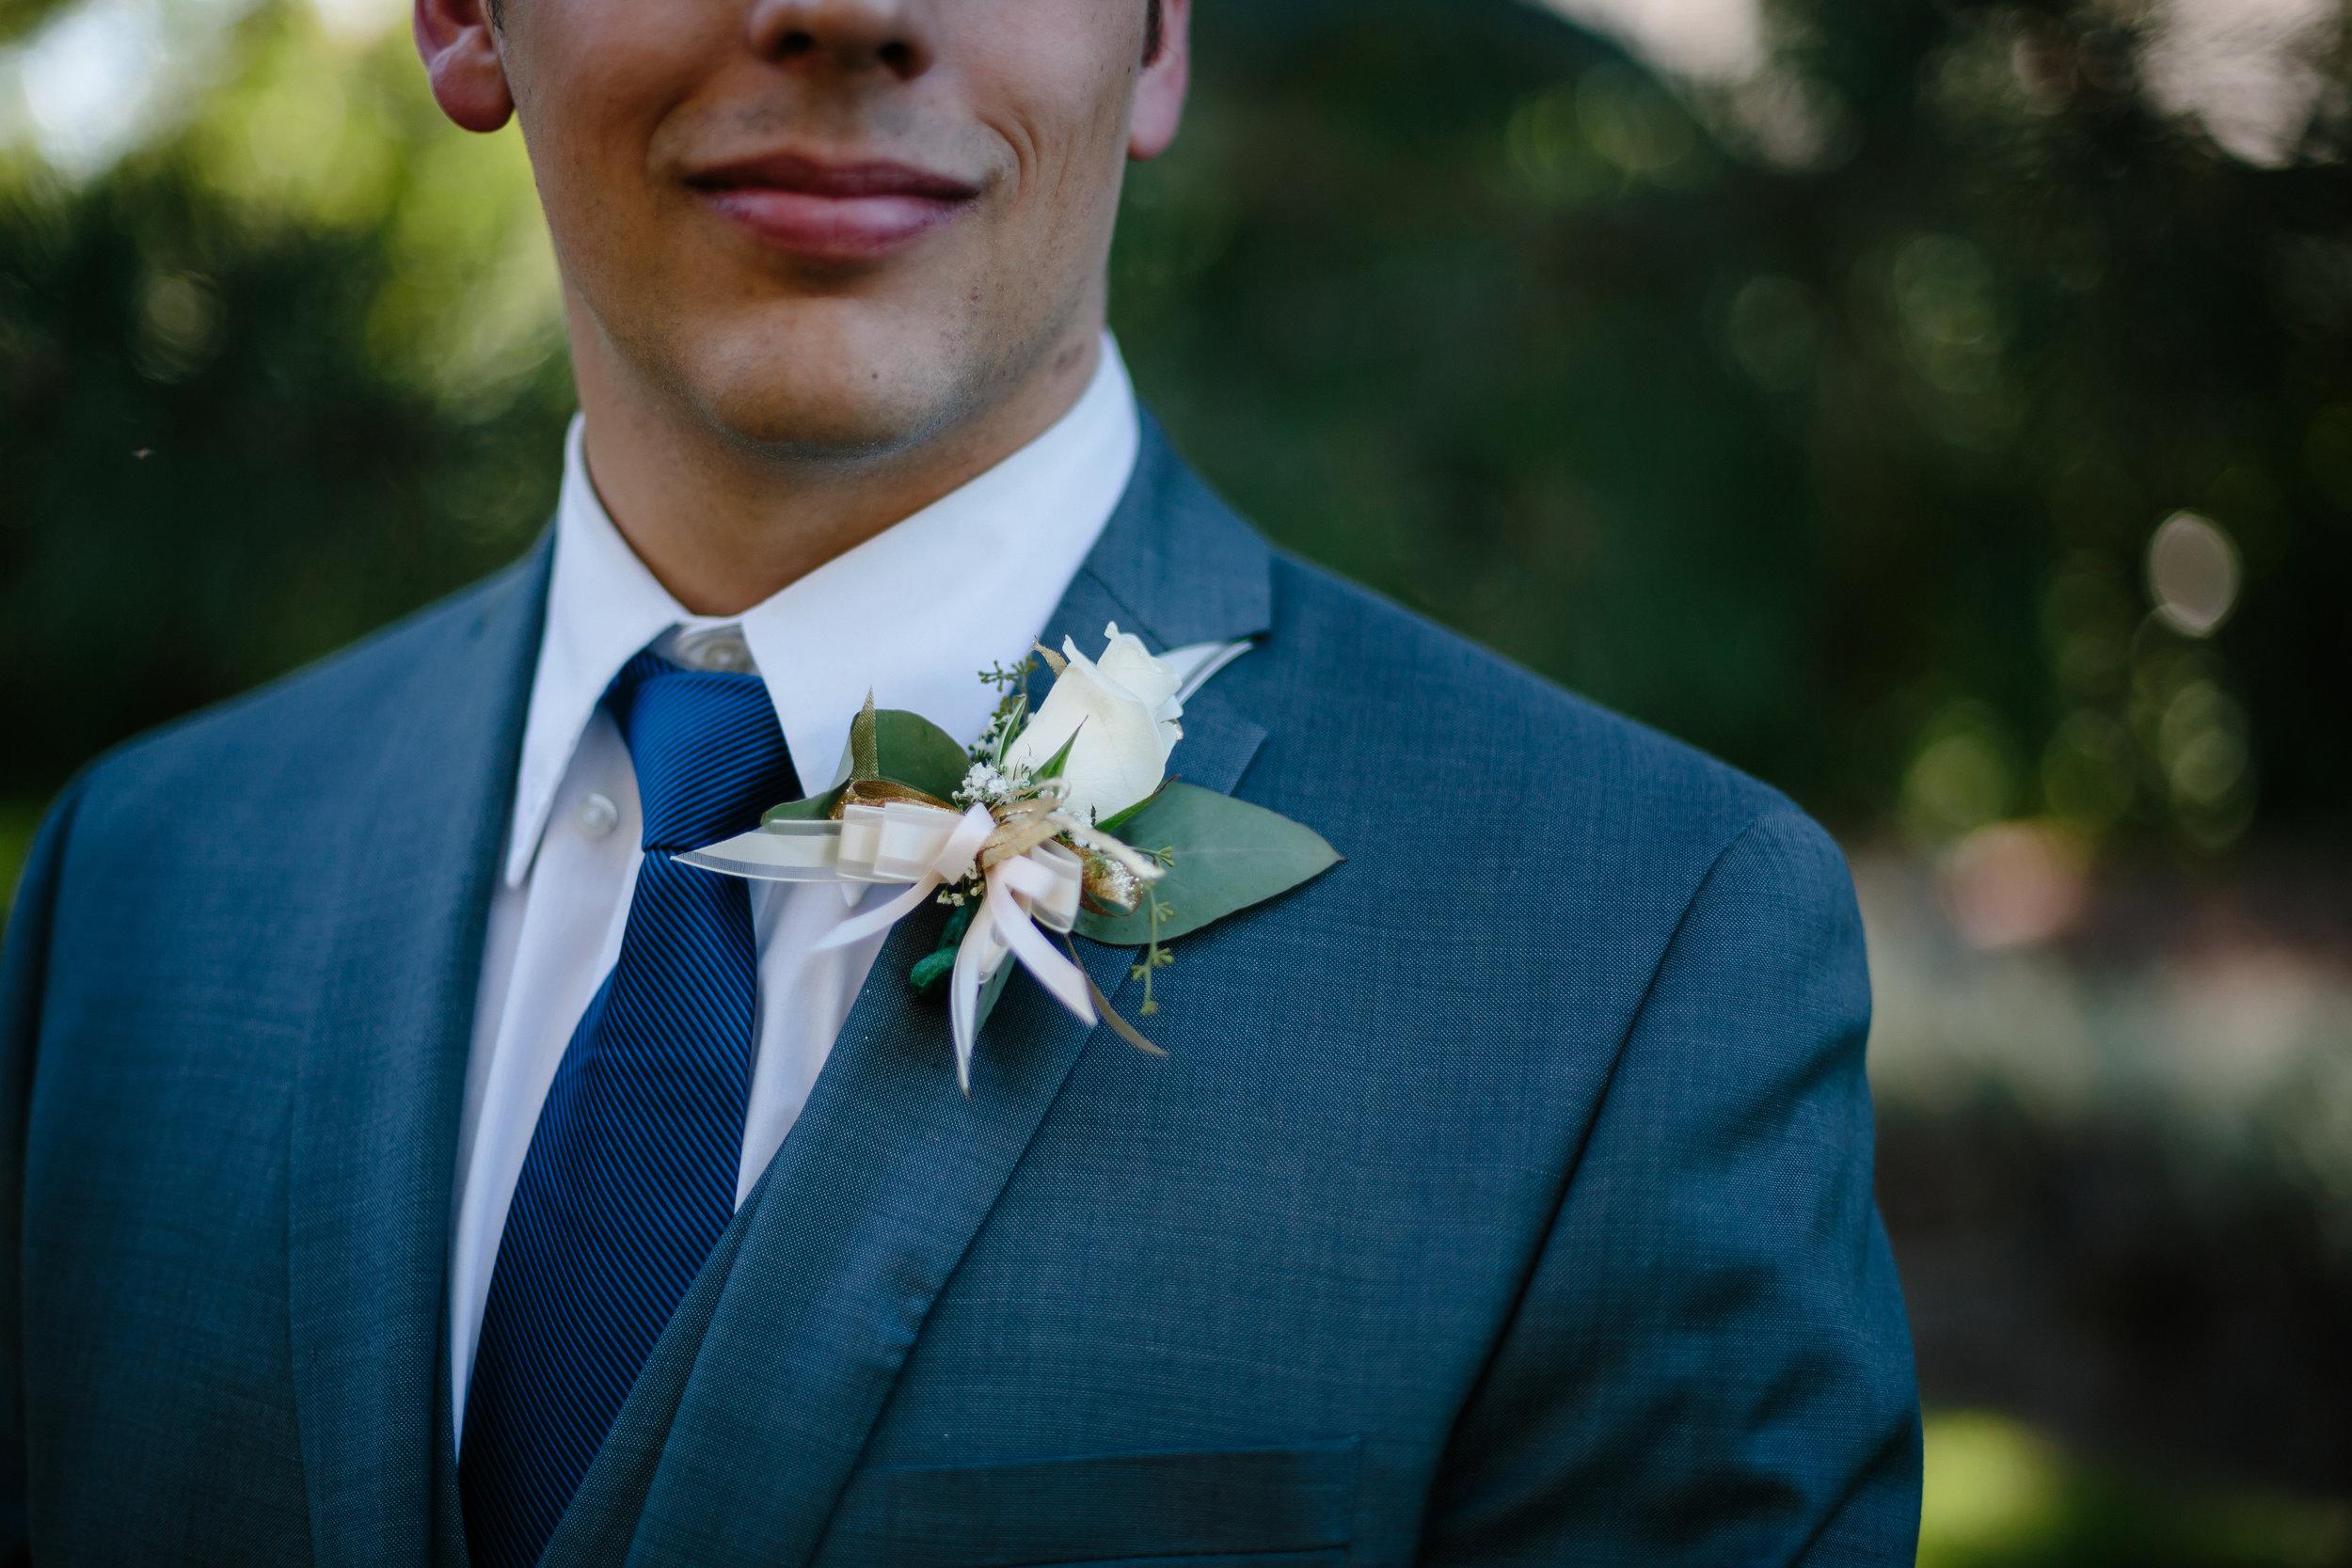 Jordan & Shantel Married - Idaho - Corrie Mick Photography-178.jpg